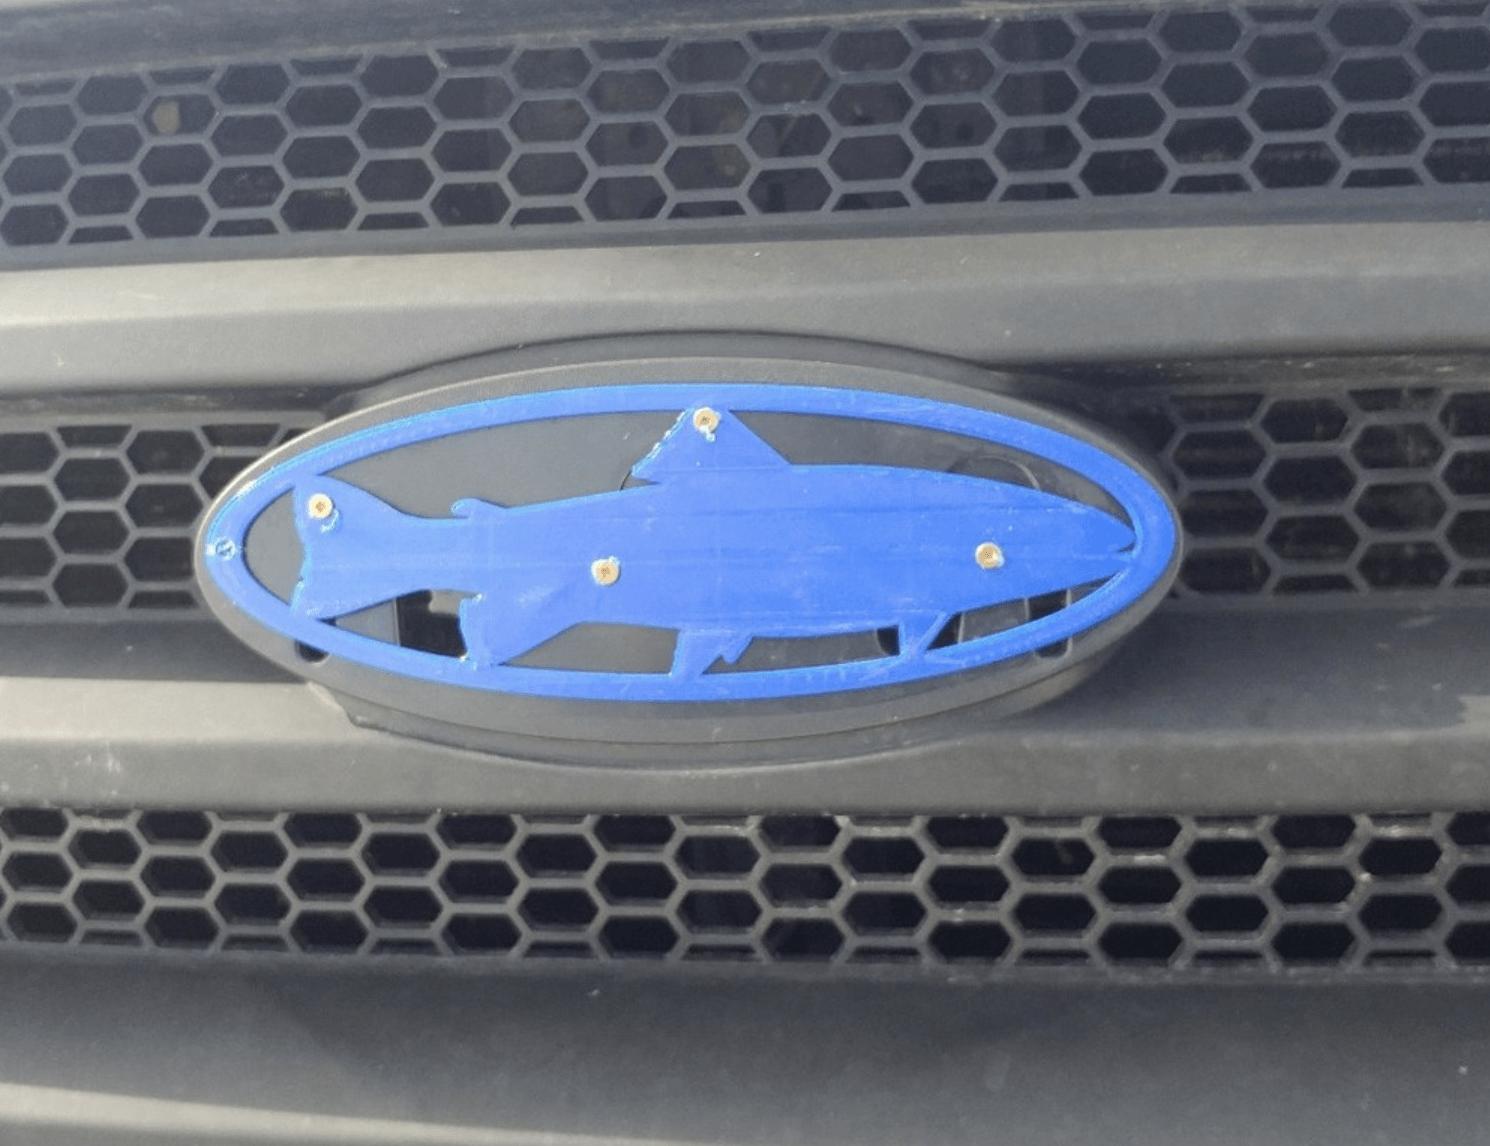 Capture d'écran 2018-04-16 à 11.20.06.png Download free STL file Ford Fish • 3D printer model, MakeItWork